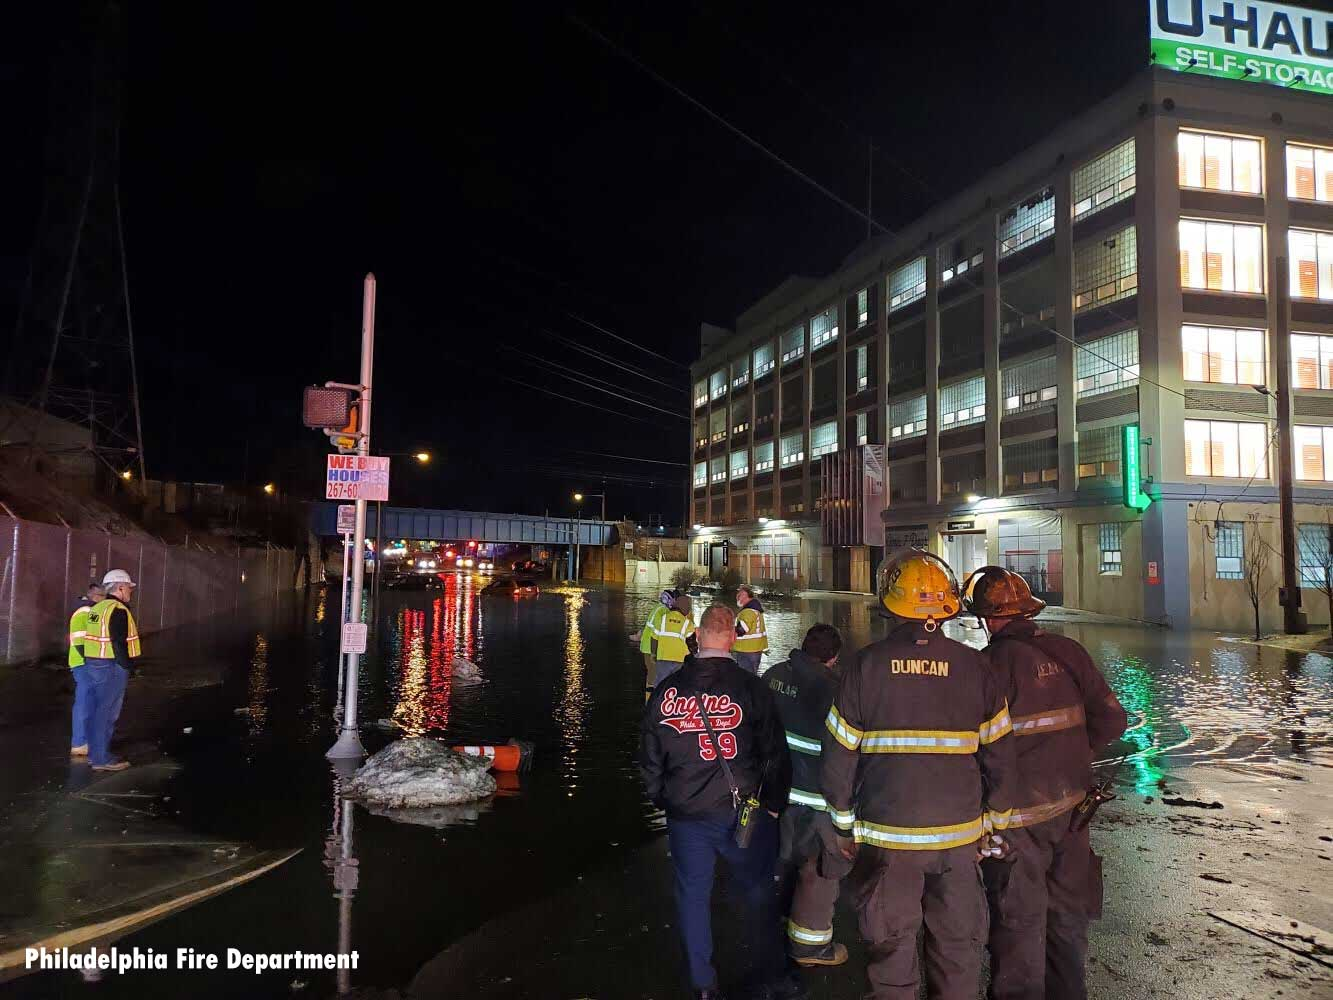 Philadelphia firefighters perform water rescues